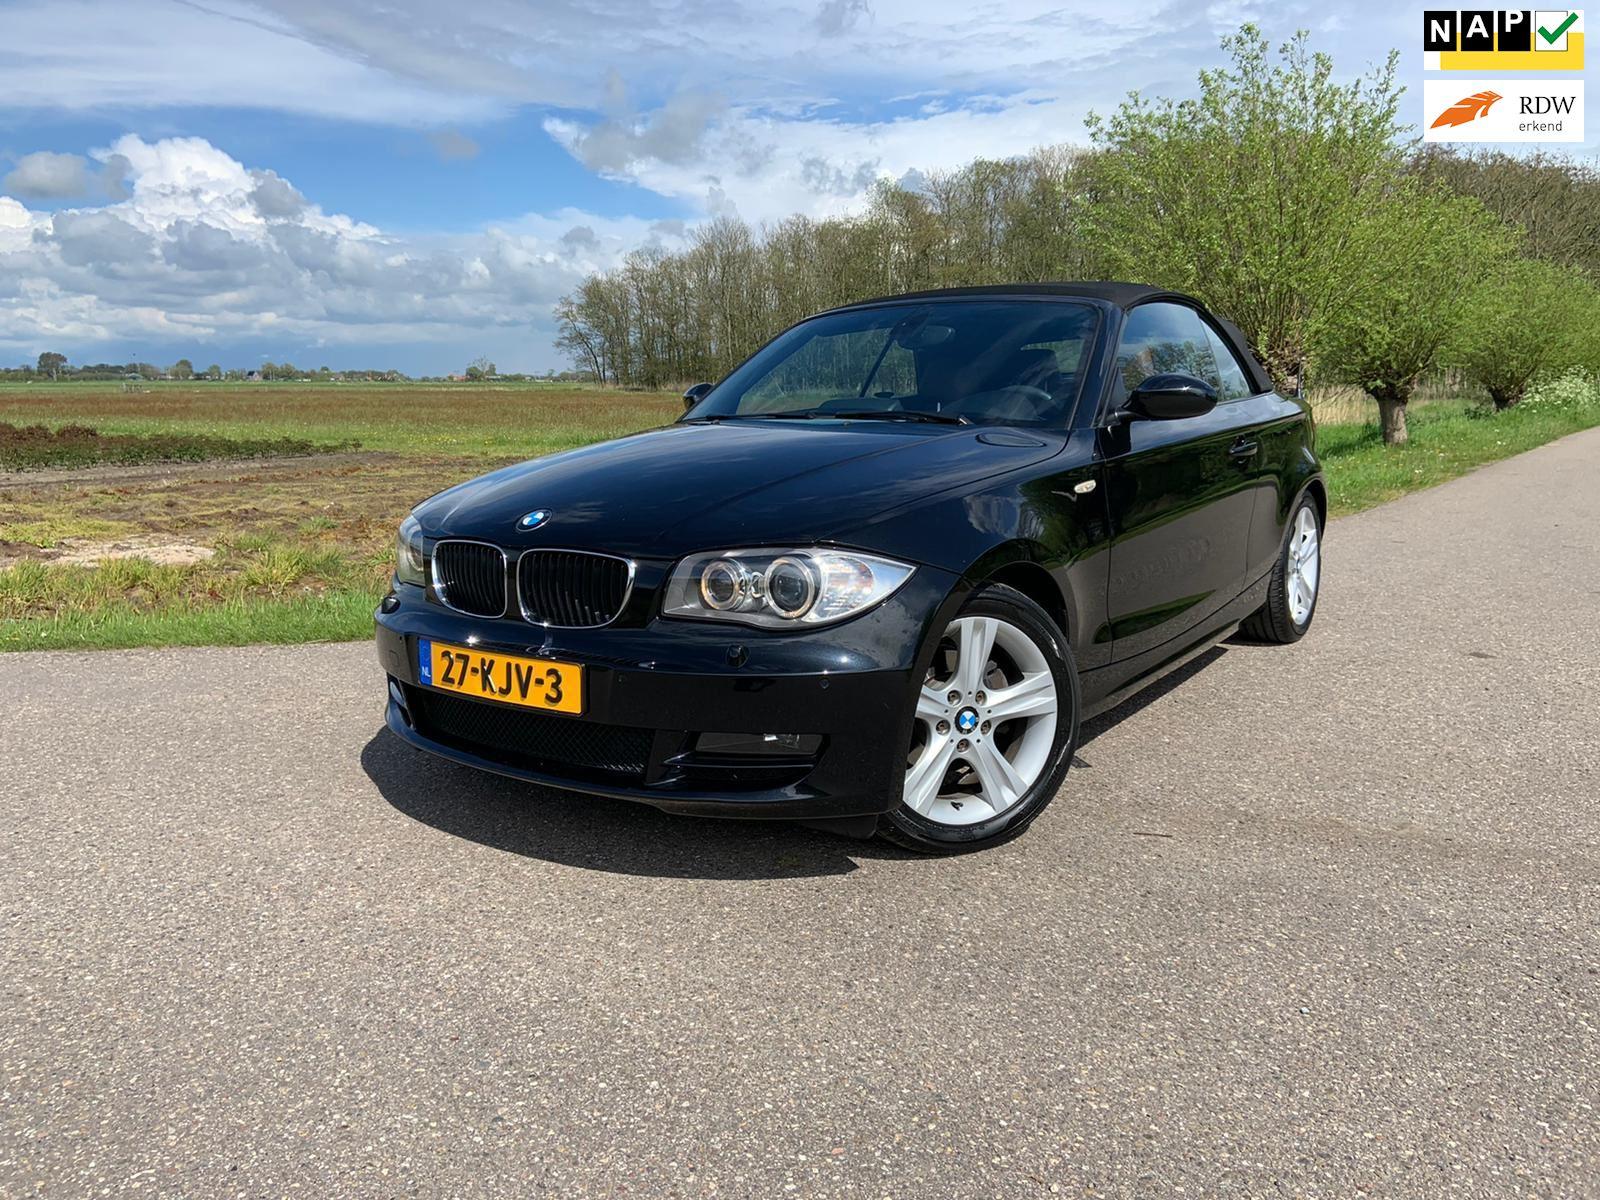 BMW 1-serie Cabrio occasion - Favoriet Occasions